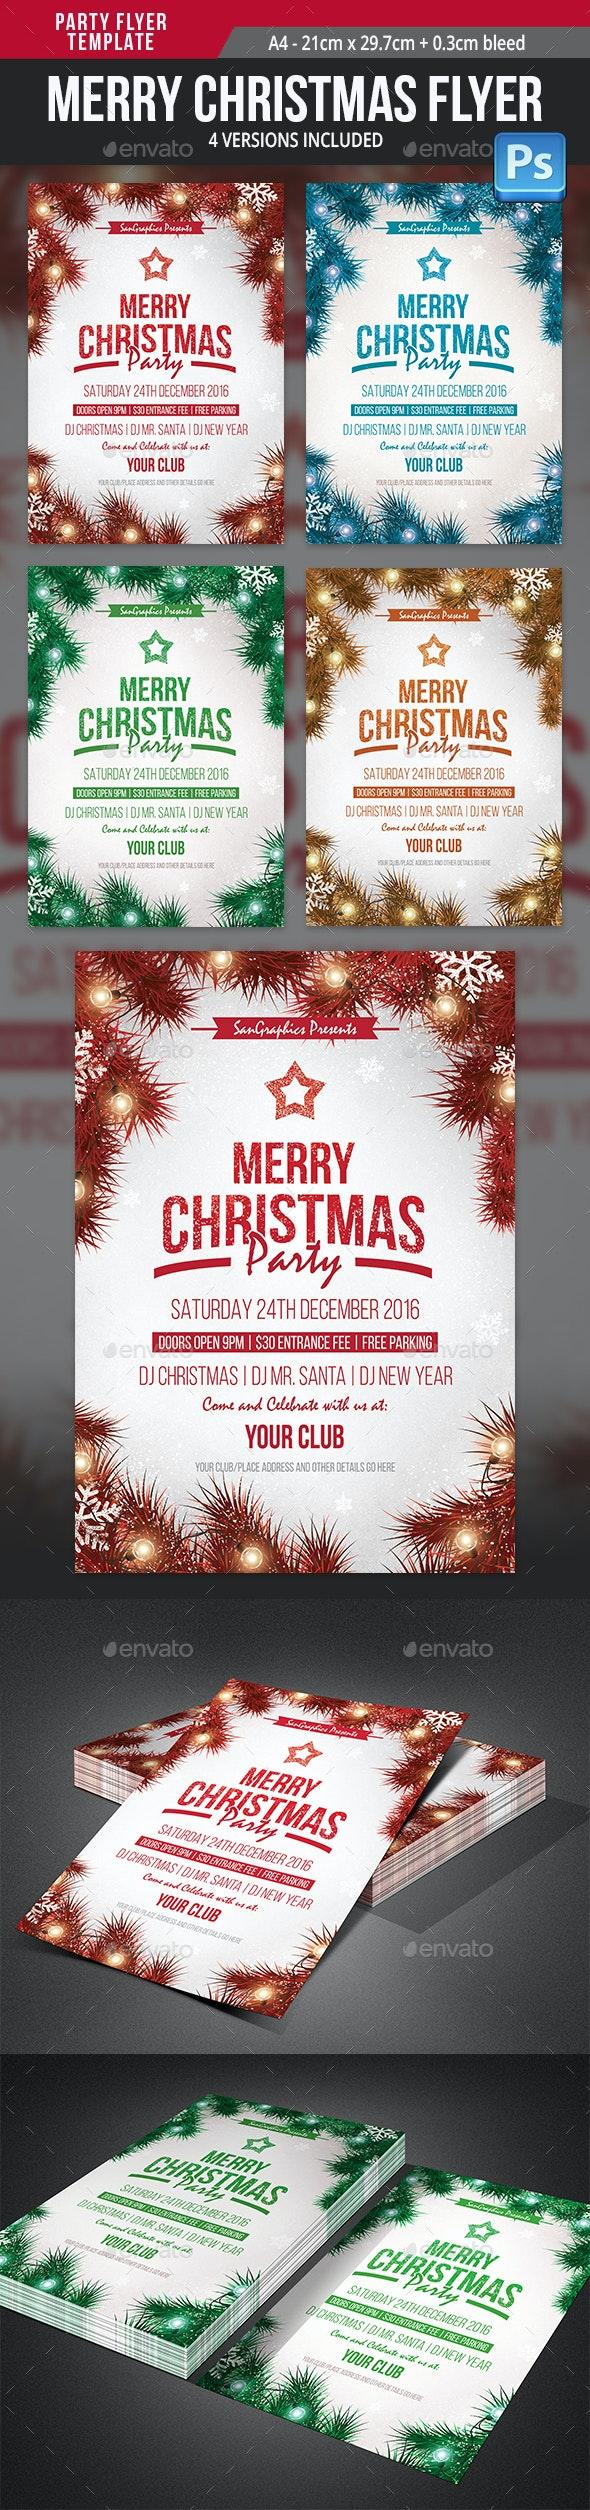 Merry Christmas Flyer Template - Flyers Print Templates